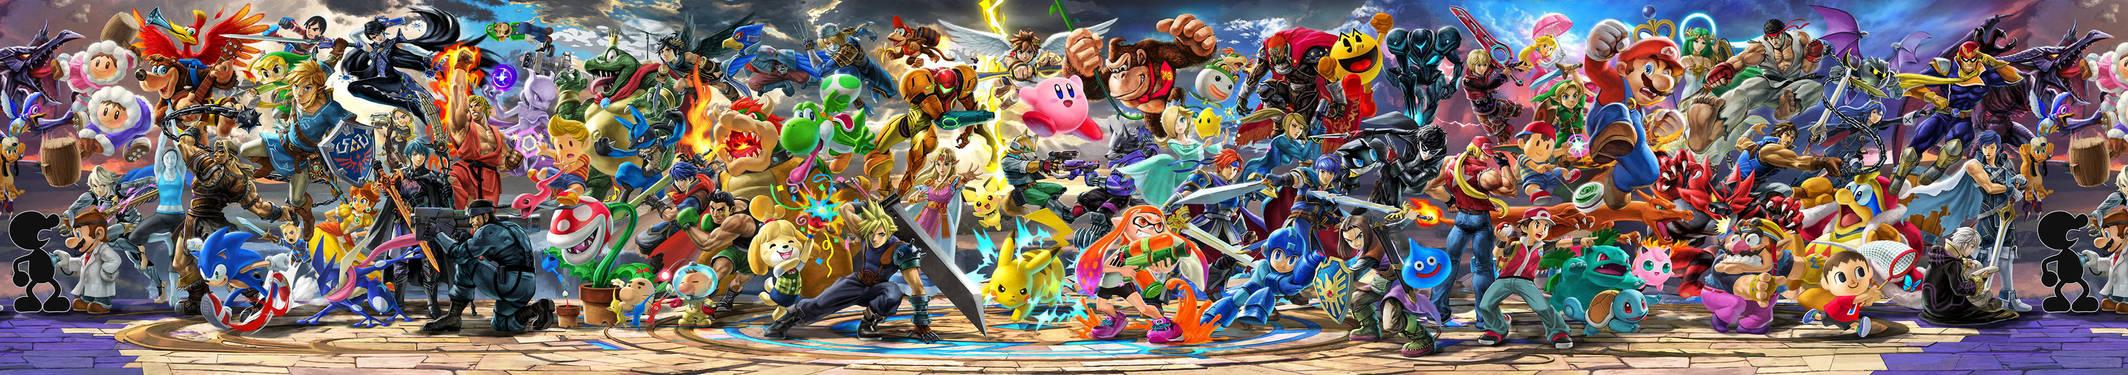 Super Smash Bros. Ultimate OFFICIAL Panoramic Art